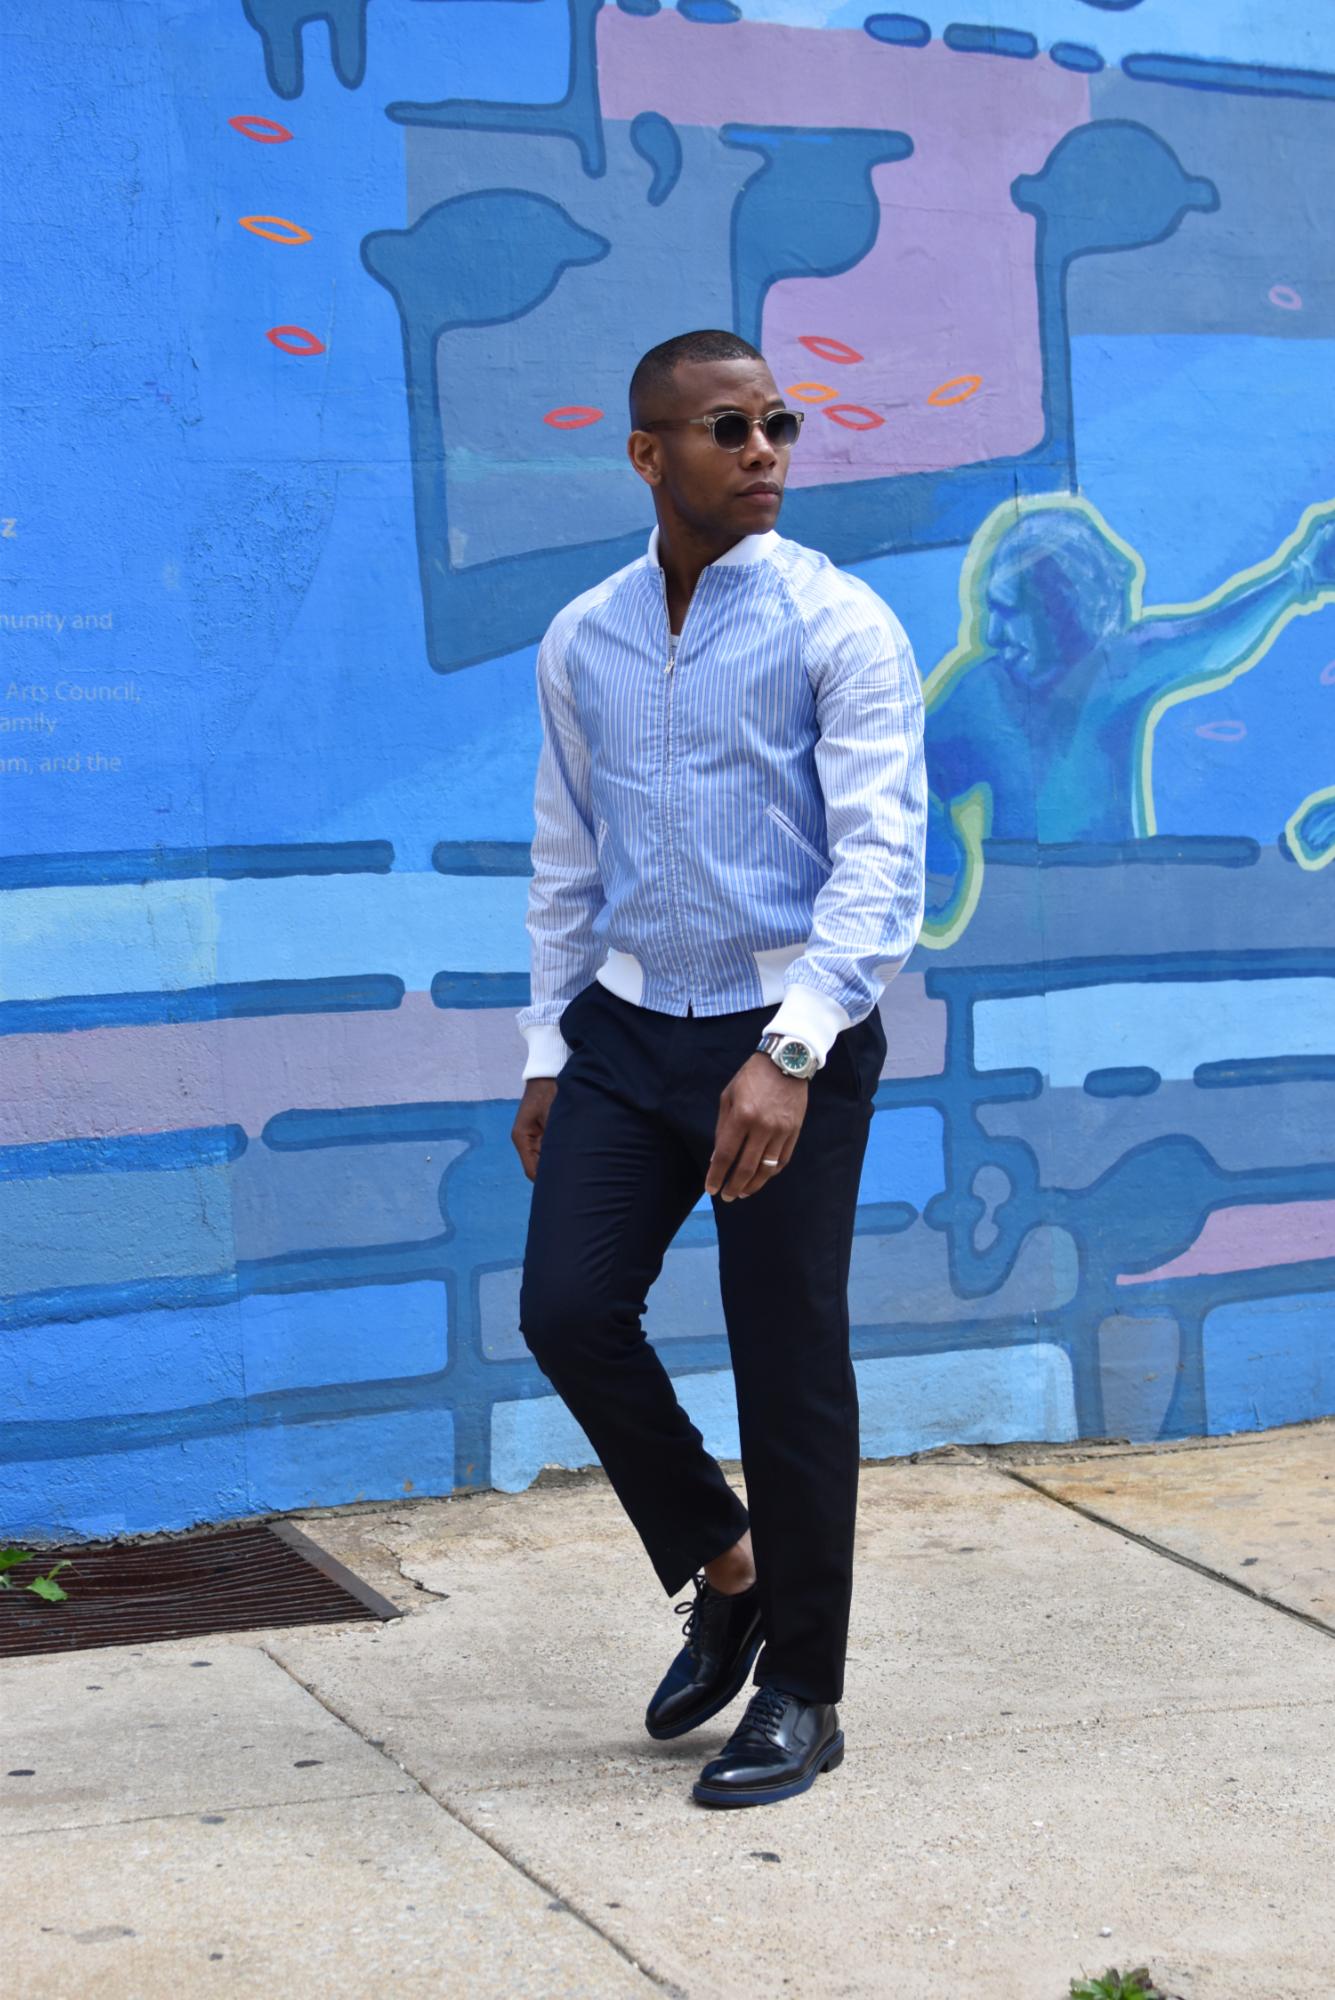 Sabir M. Peele of Men's Style Pro wearing Comme des Garcons Shirt Bomber Jacket